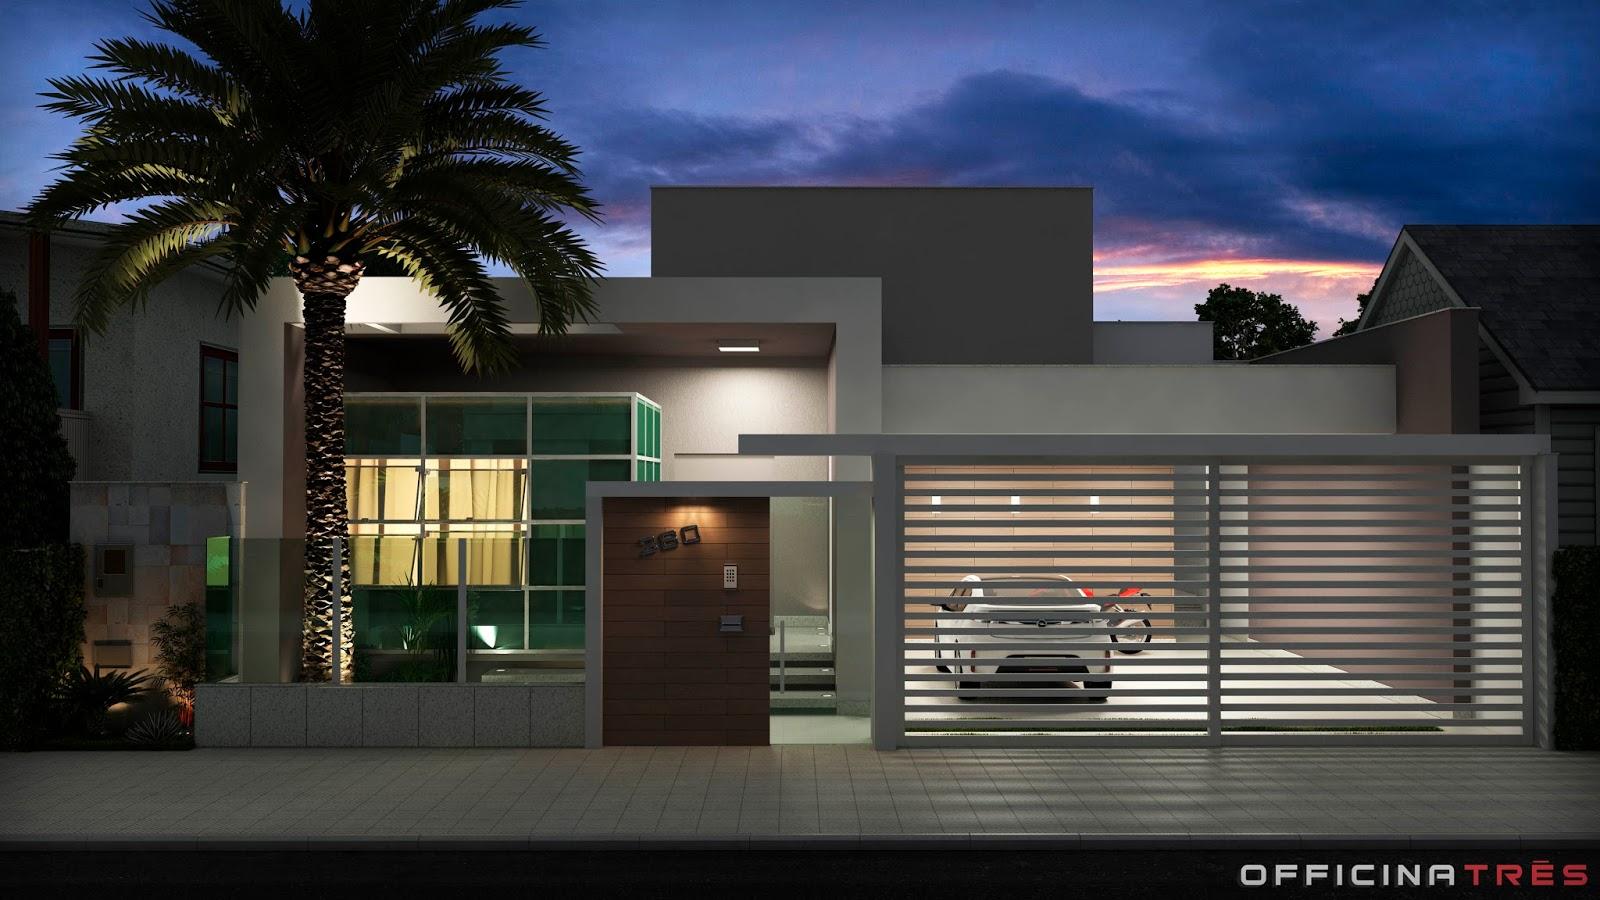 Officinatr s casa moderna em mutum mg - Modelo de casa modernas ...